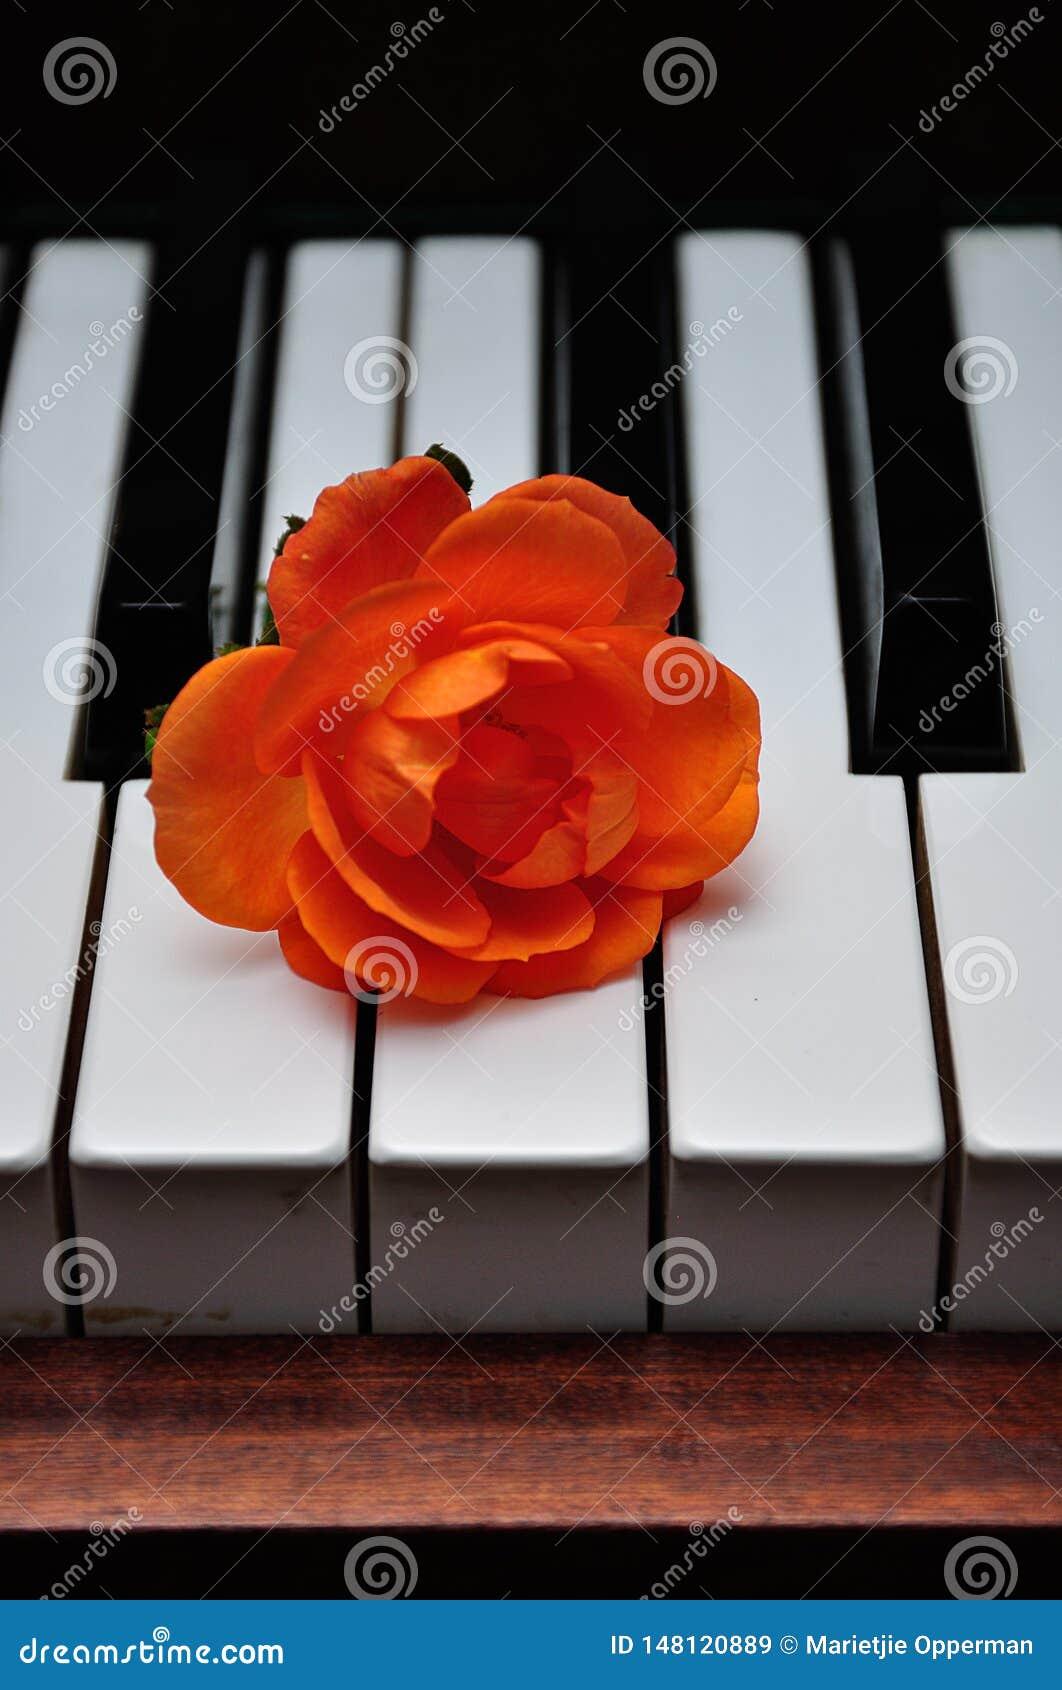 An orange rose displayed on top of piano keys